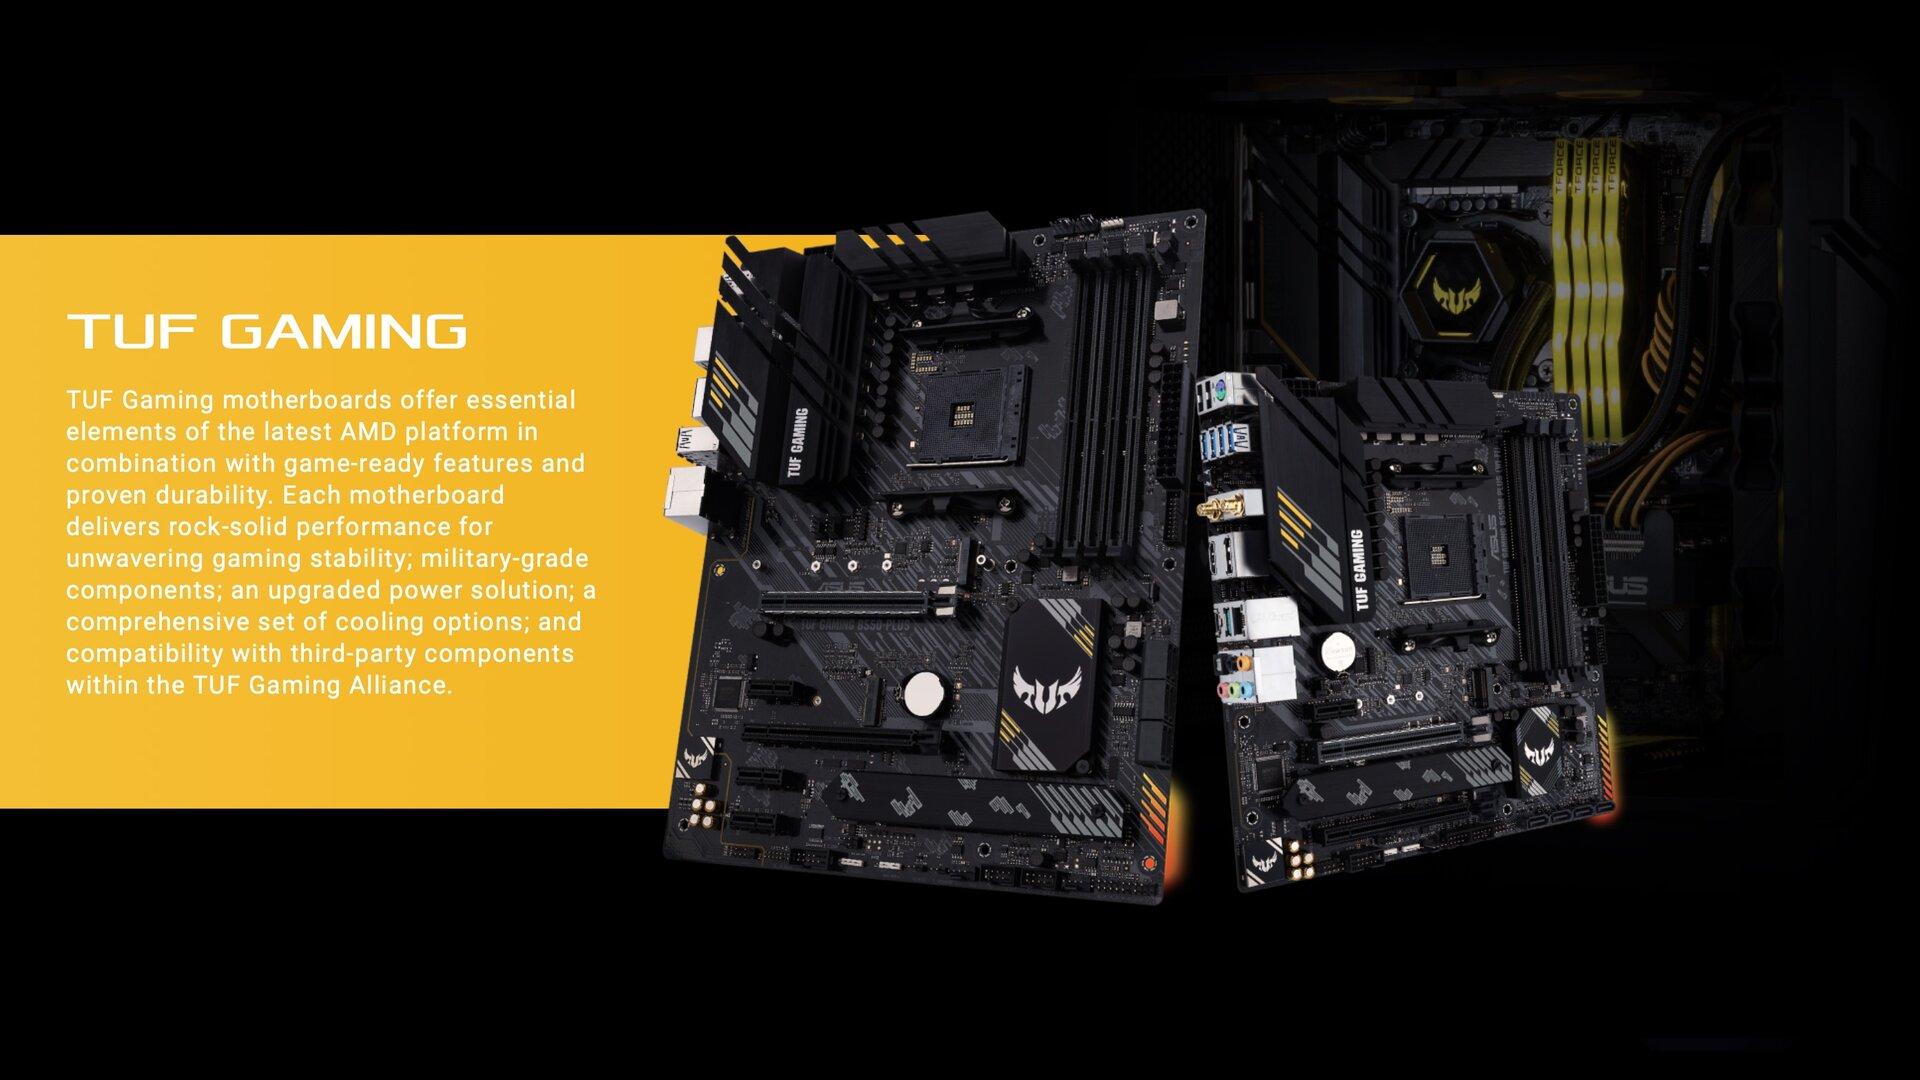 Asus TUF Gaming mit AMDs B550-Chipsatz